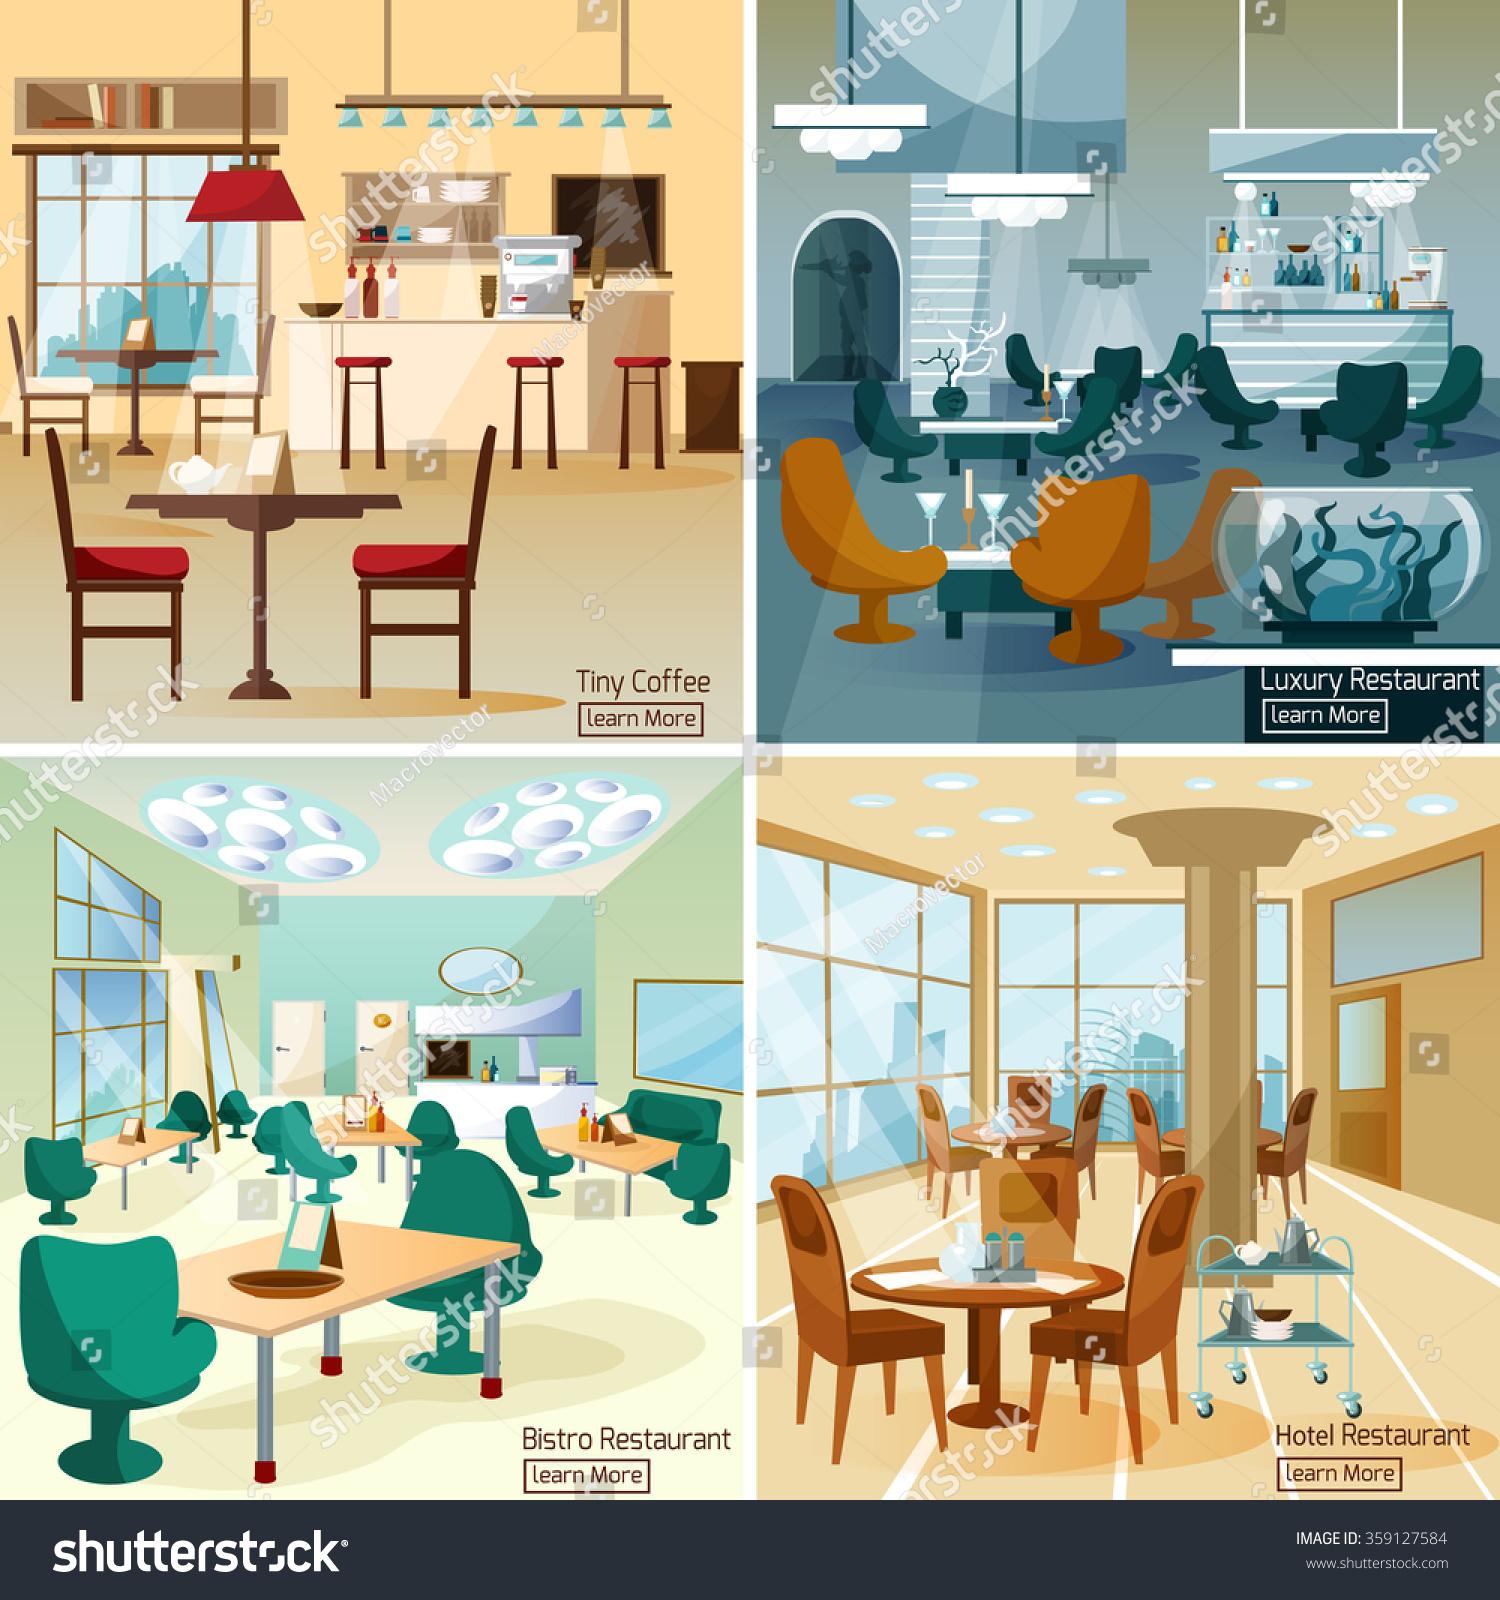 Luxury hotel coffee bar interior stock vector